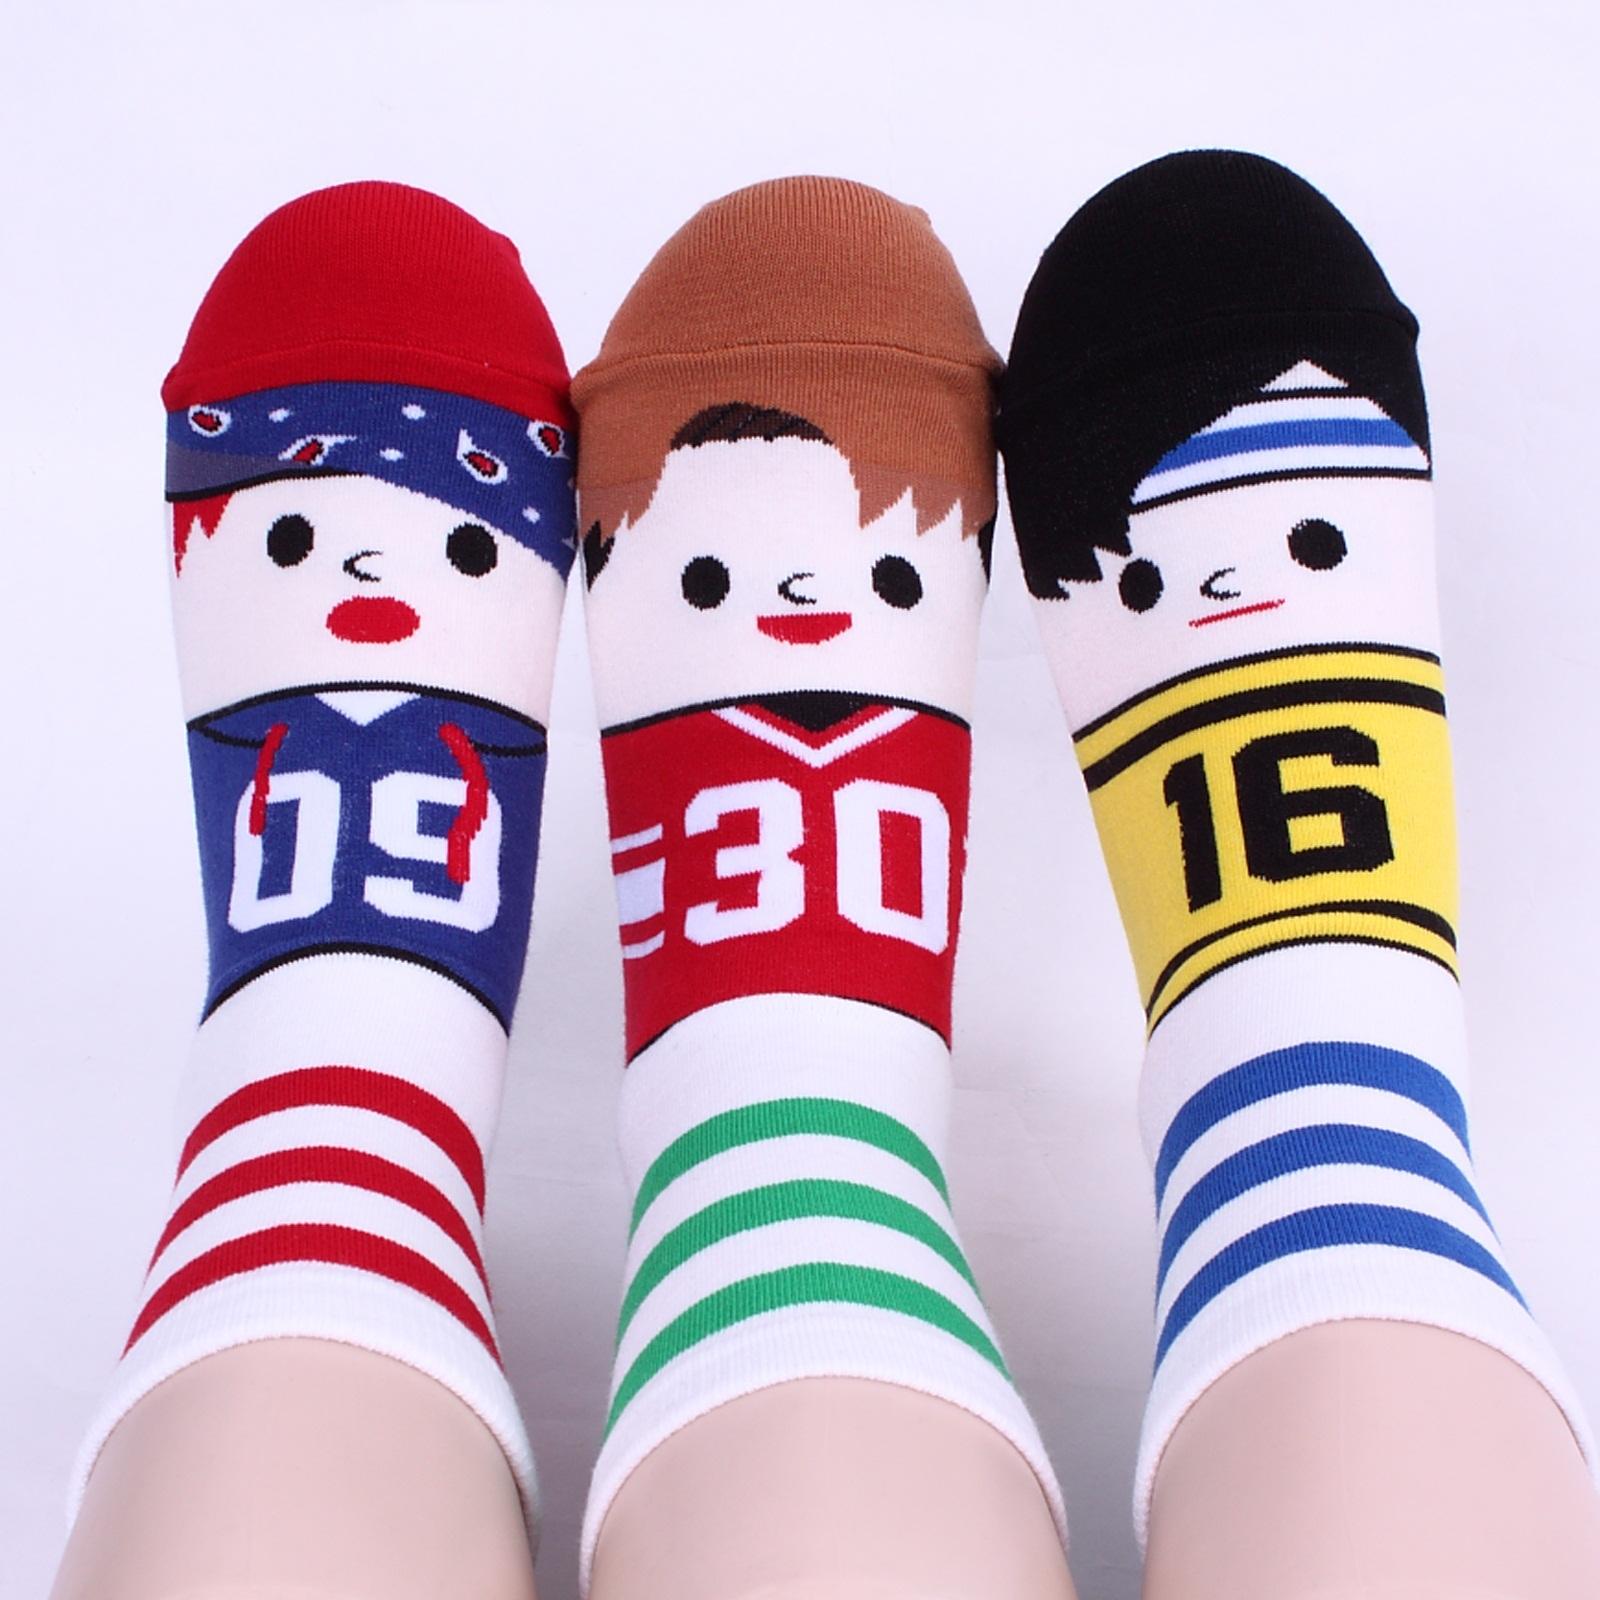 Qoo102015 新製品 韓国産 靴下 おまけ[5+1 / 10+2 / 20+4 ] intype 最安価 2014新商品多量入荷可愛いキャラクター靴下 韓国製のハイクォリティ  SOCKS